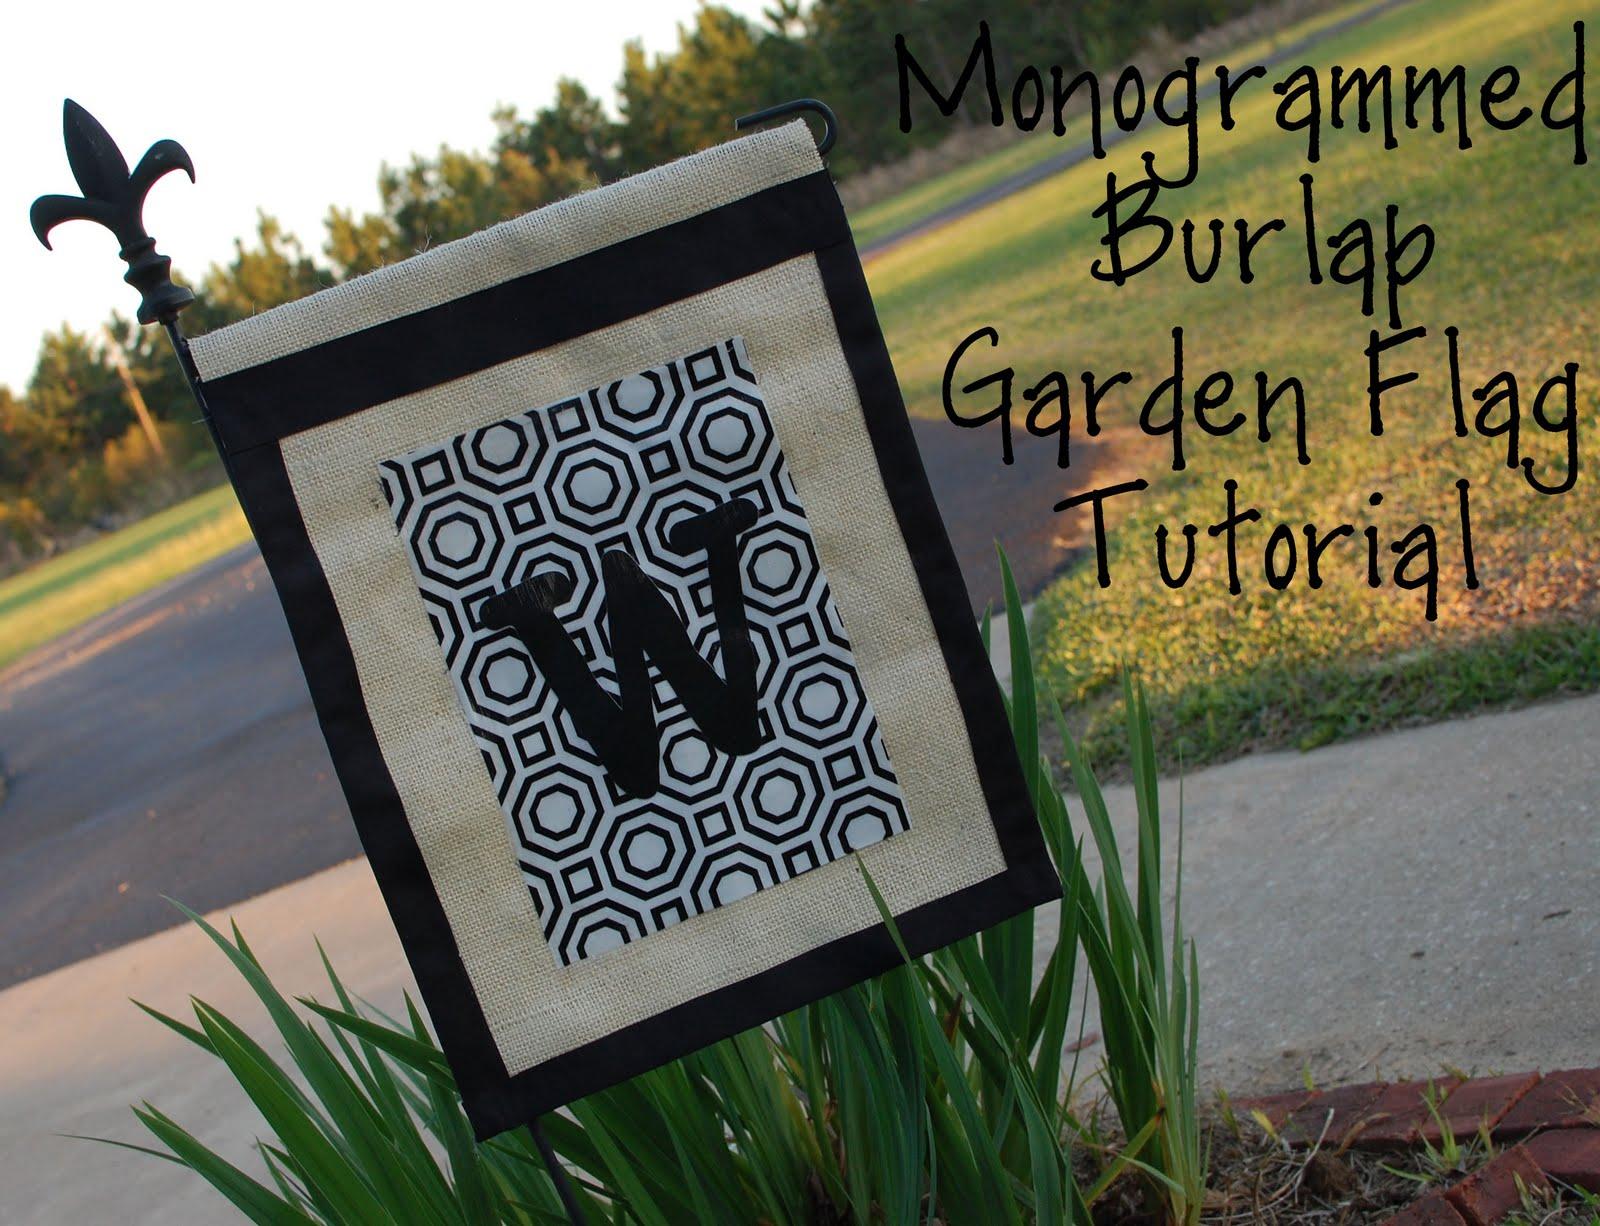 Guest Project Monogrammed Burlap Garden Flag Tutorial